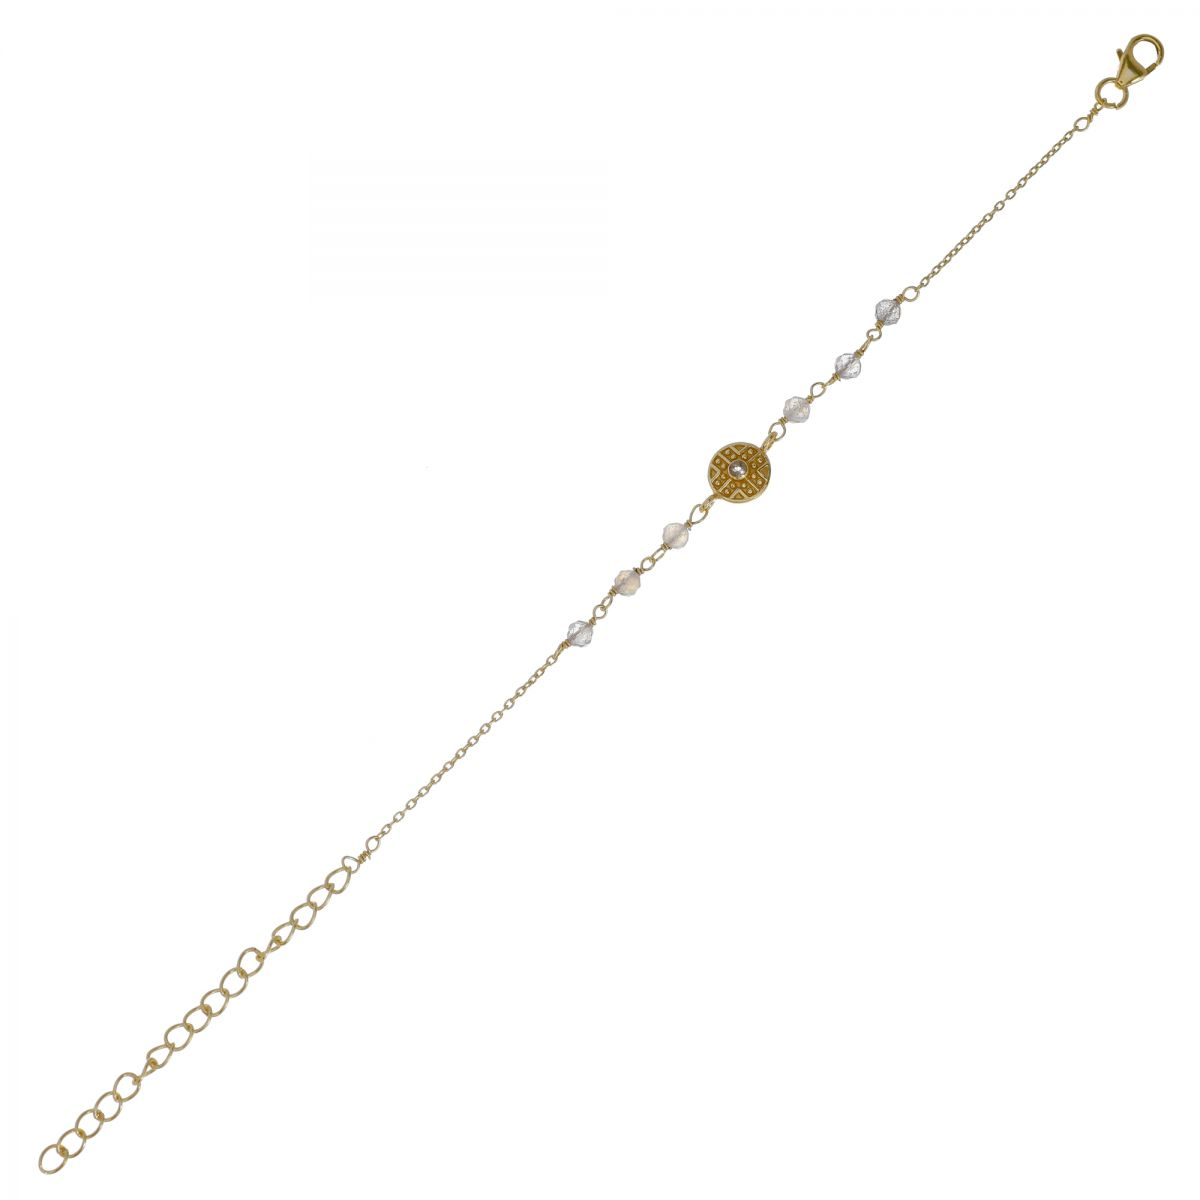 g bracelet labradorite beads with labyrinth coin gold pl